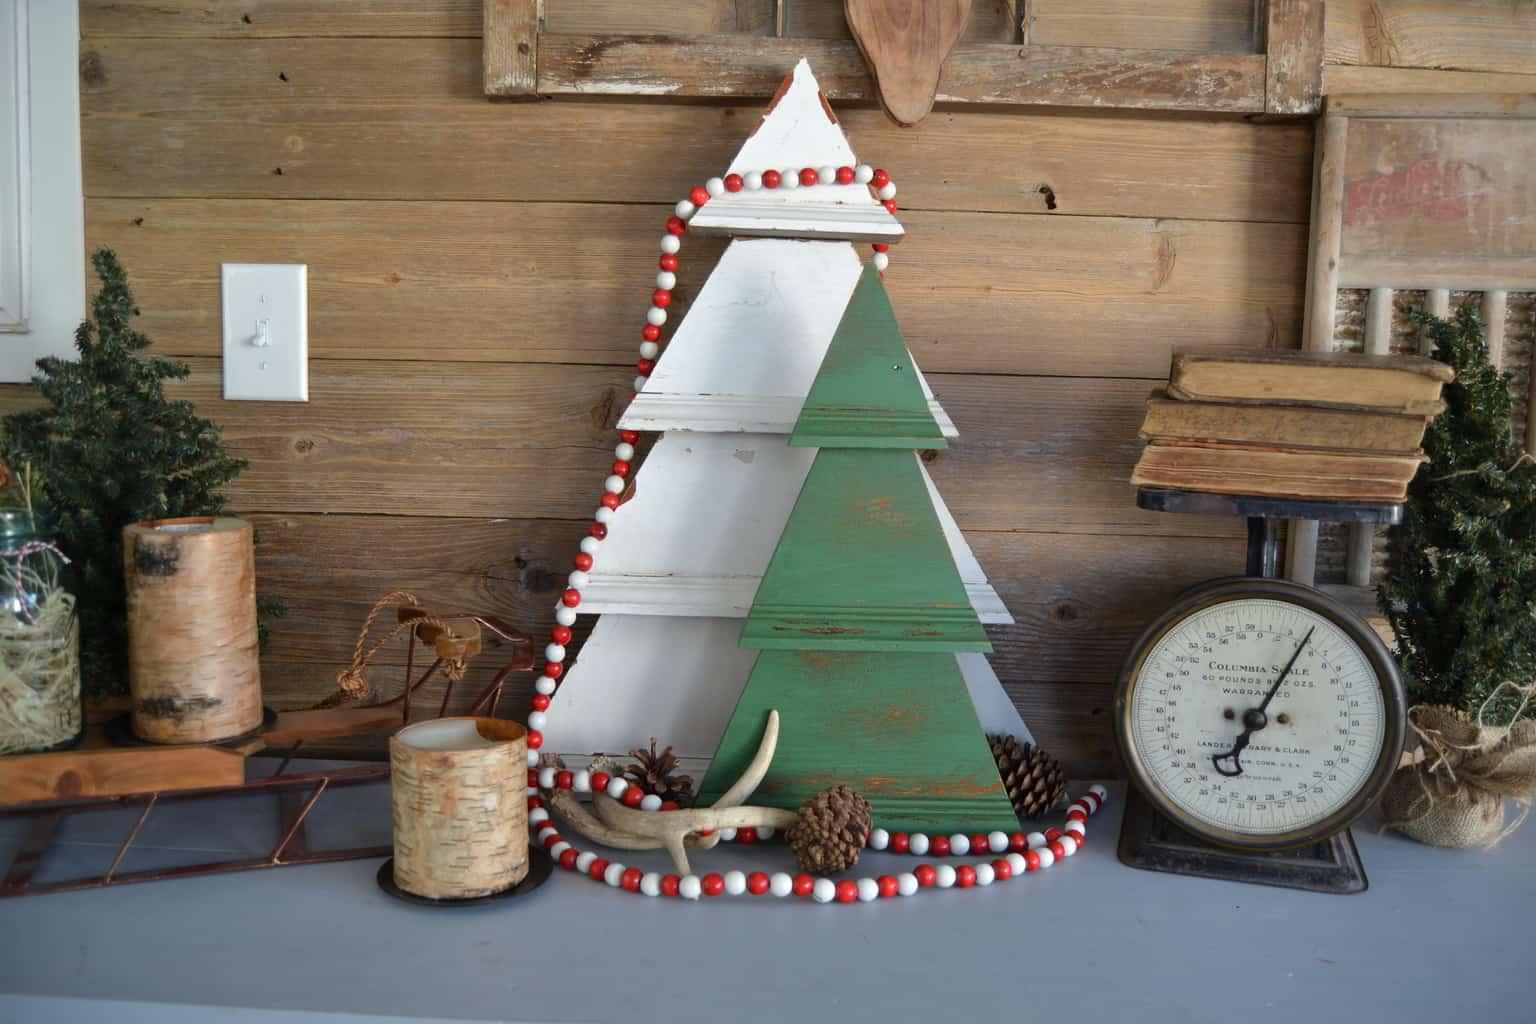 Rustic christmas decorations diy - Pin This Diy Rustic Christmas Tree Decoration